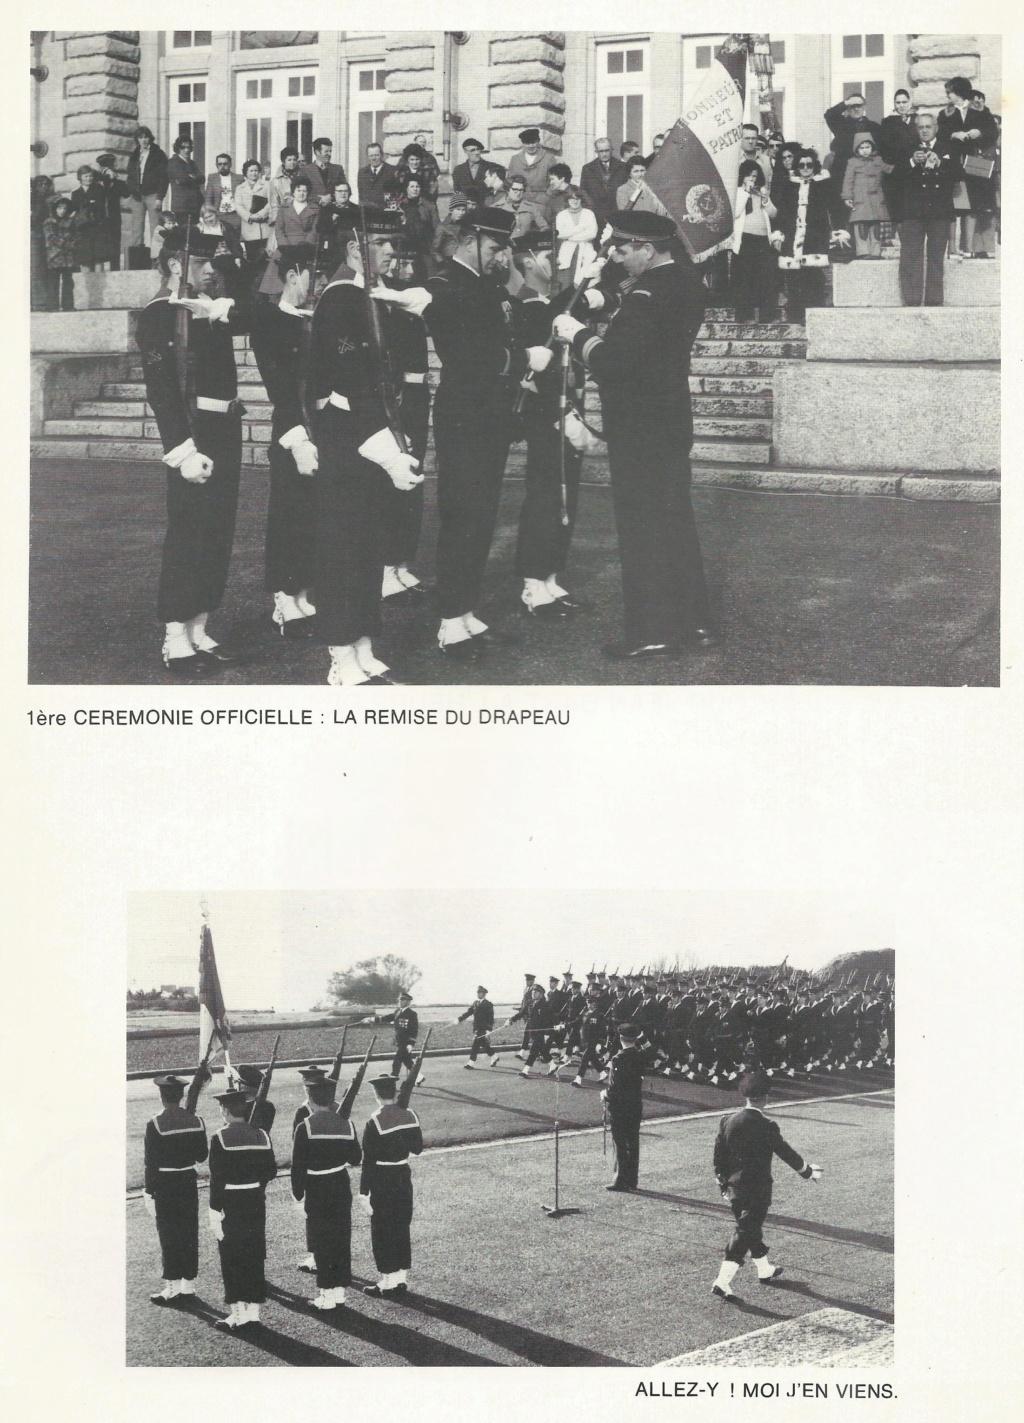 [ École des Mousses ] École des mousses 76/77 Mousse31